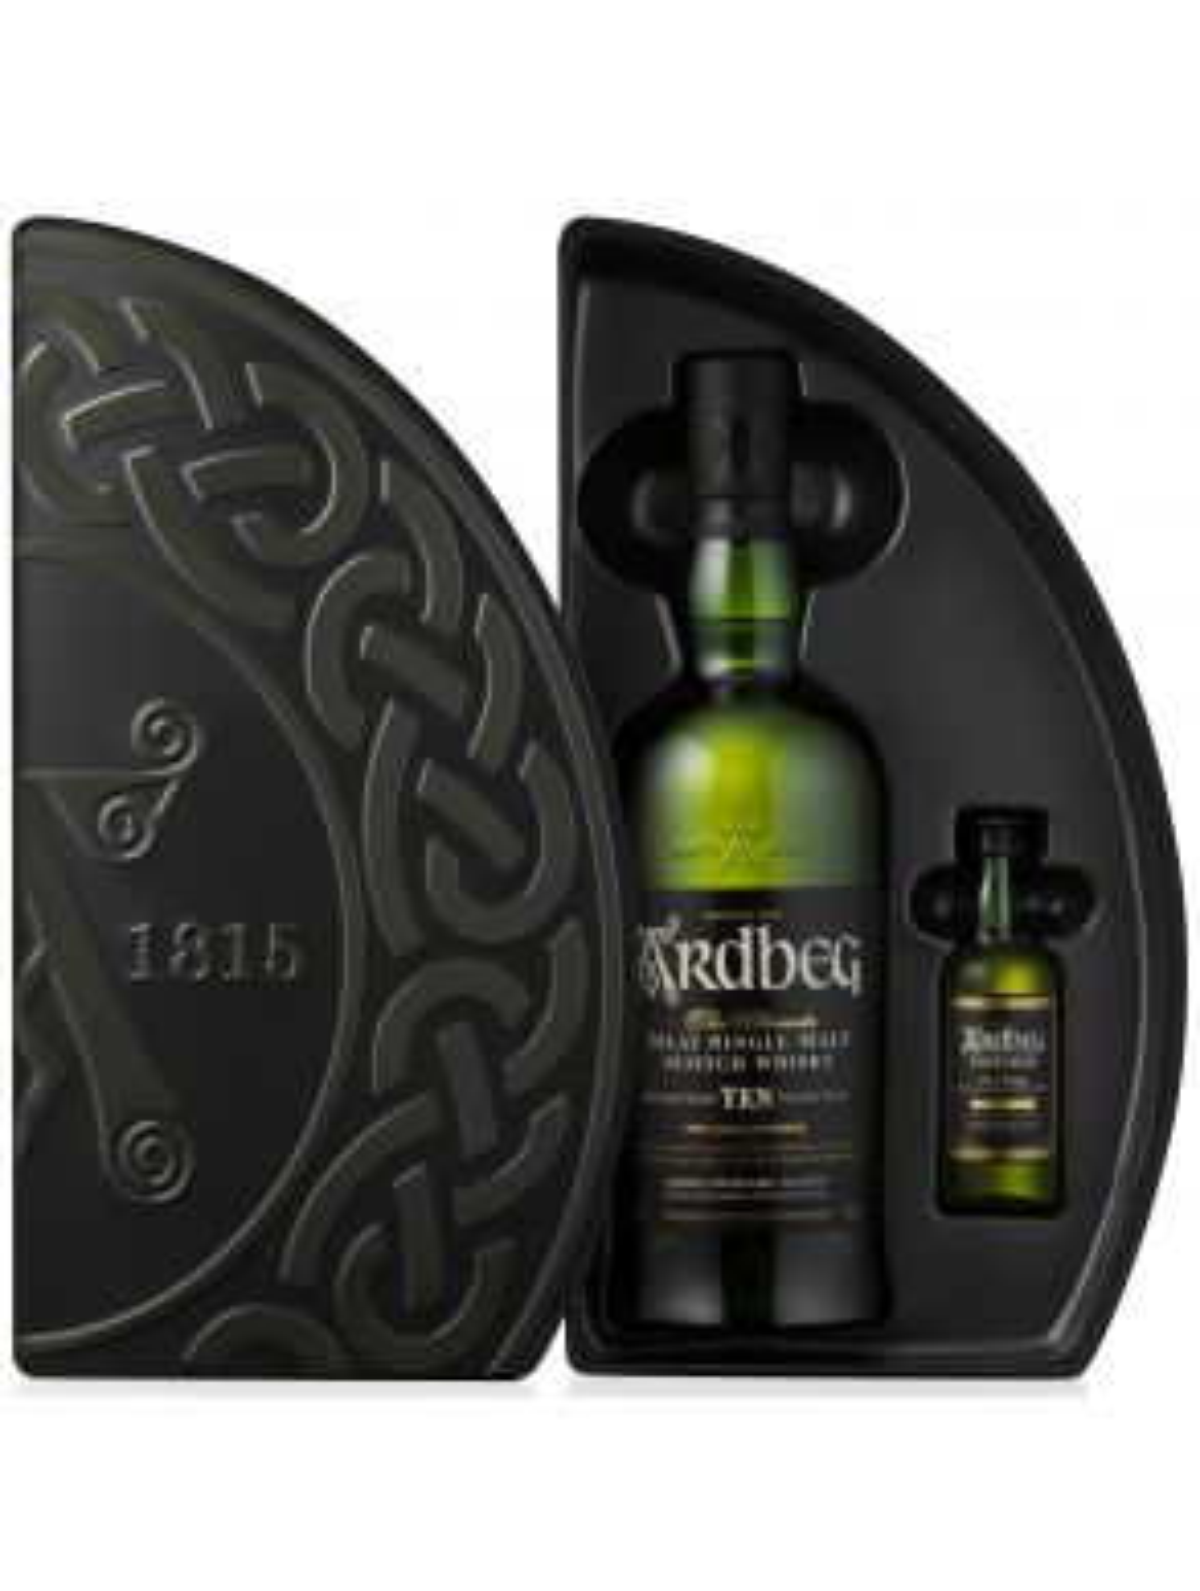 Ardbeg 10 year old Single Malt 70cl & Uigeadail Whisky 5cl Gift Set